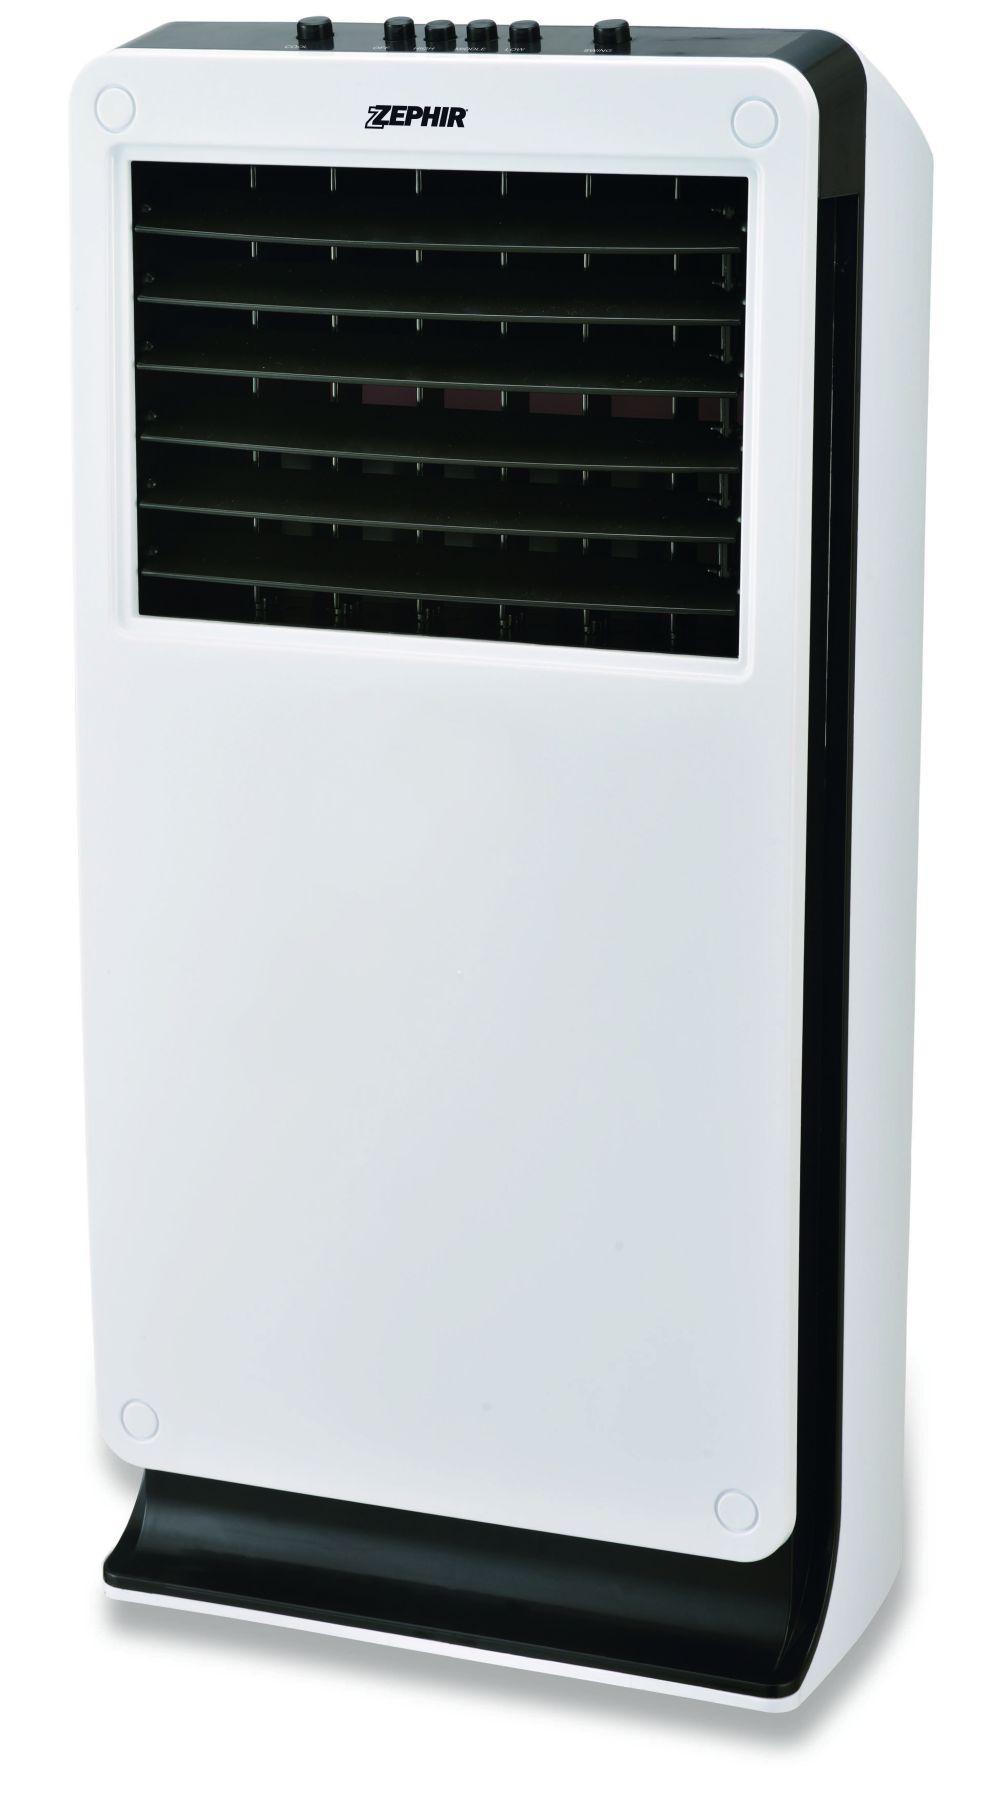 Ventilatore raffrescatore evaporativo zephir zair01 for Deumidificatore funzionamento